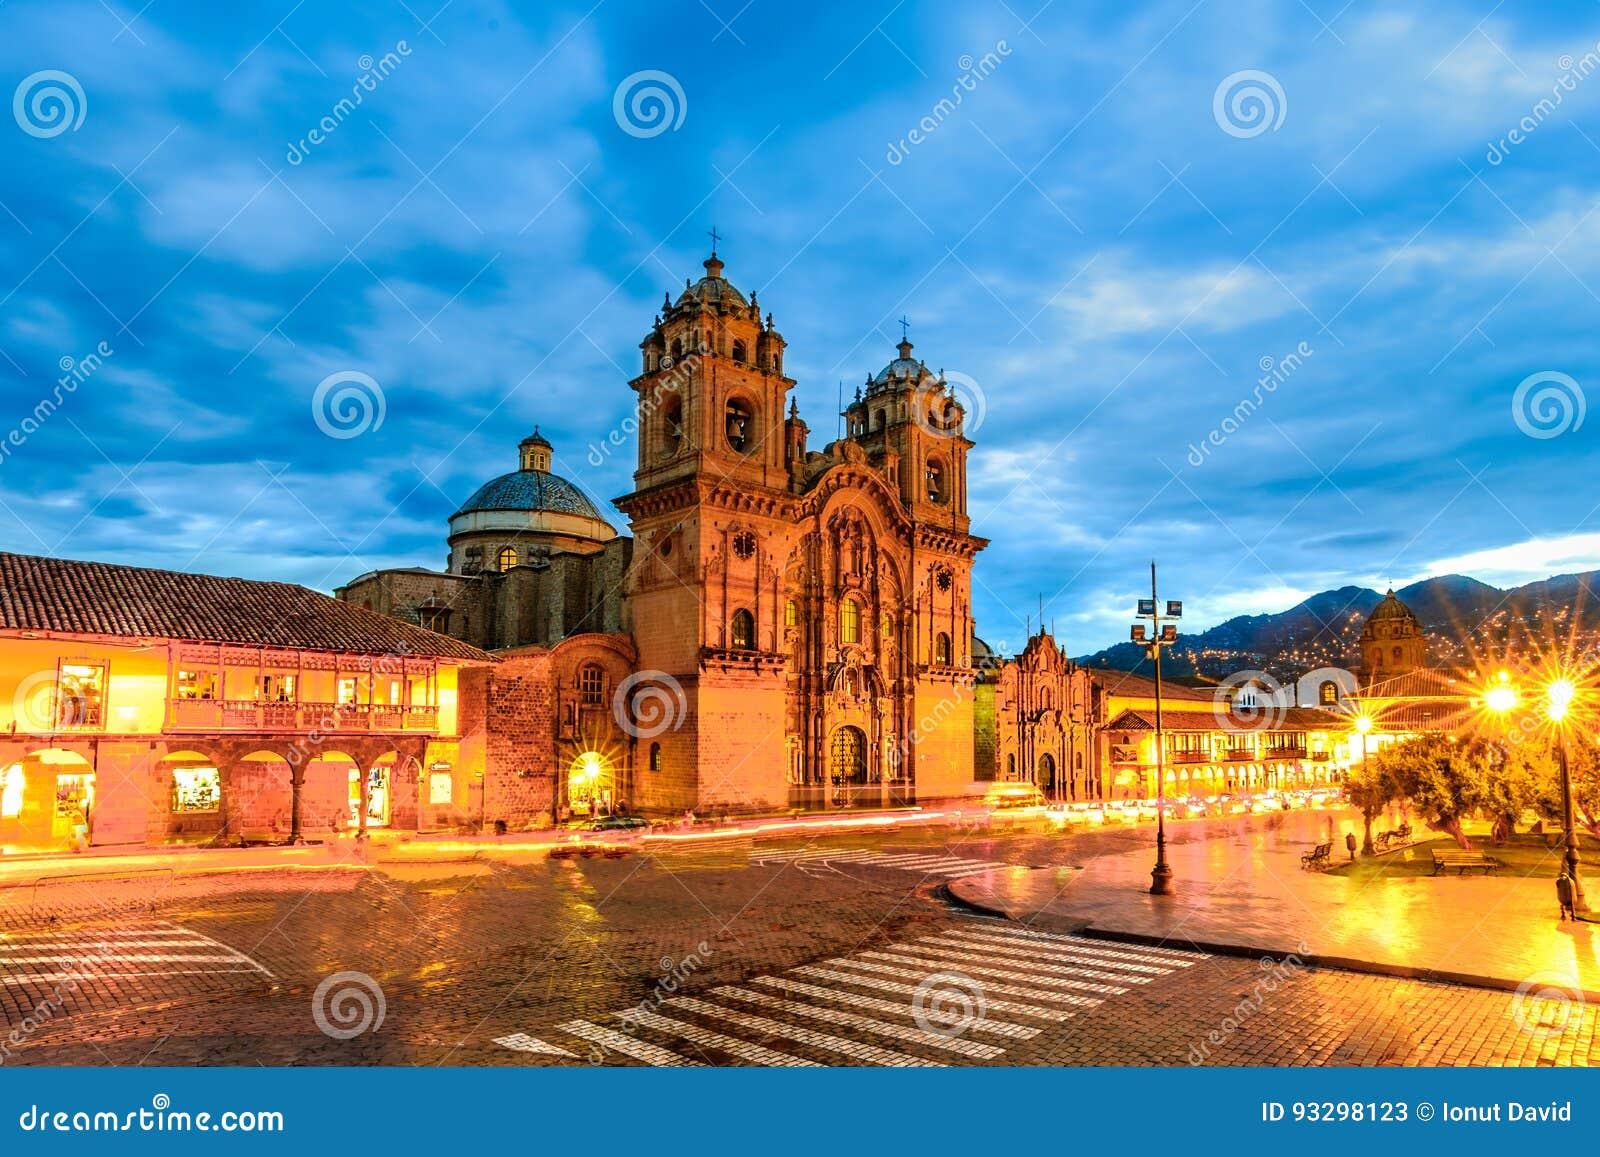 Cusco, Perú - Plaza de Armas e iglesia de la sociedad de Jesús